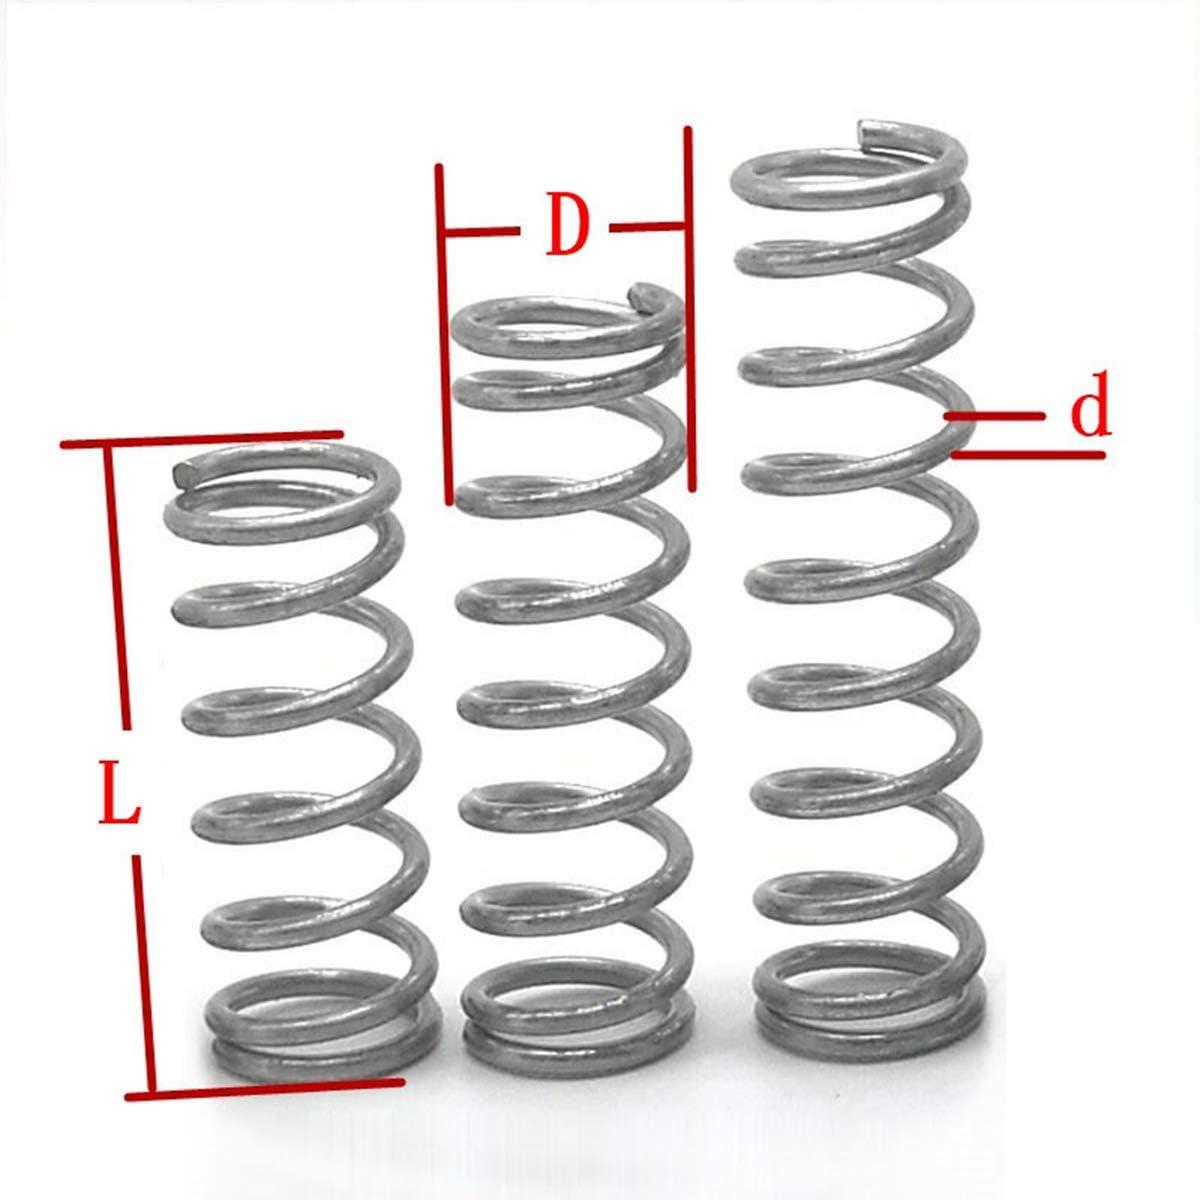 20Pcs Drahtdurchmesser = 0.5mm Od = 4mm Edelstahl Micro Return Kleine Compression Anti Corrosion Zugfedern 0,5 x 4 x 10 mm